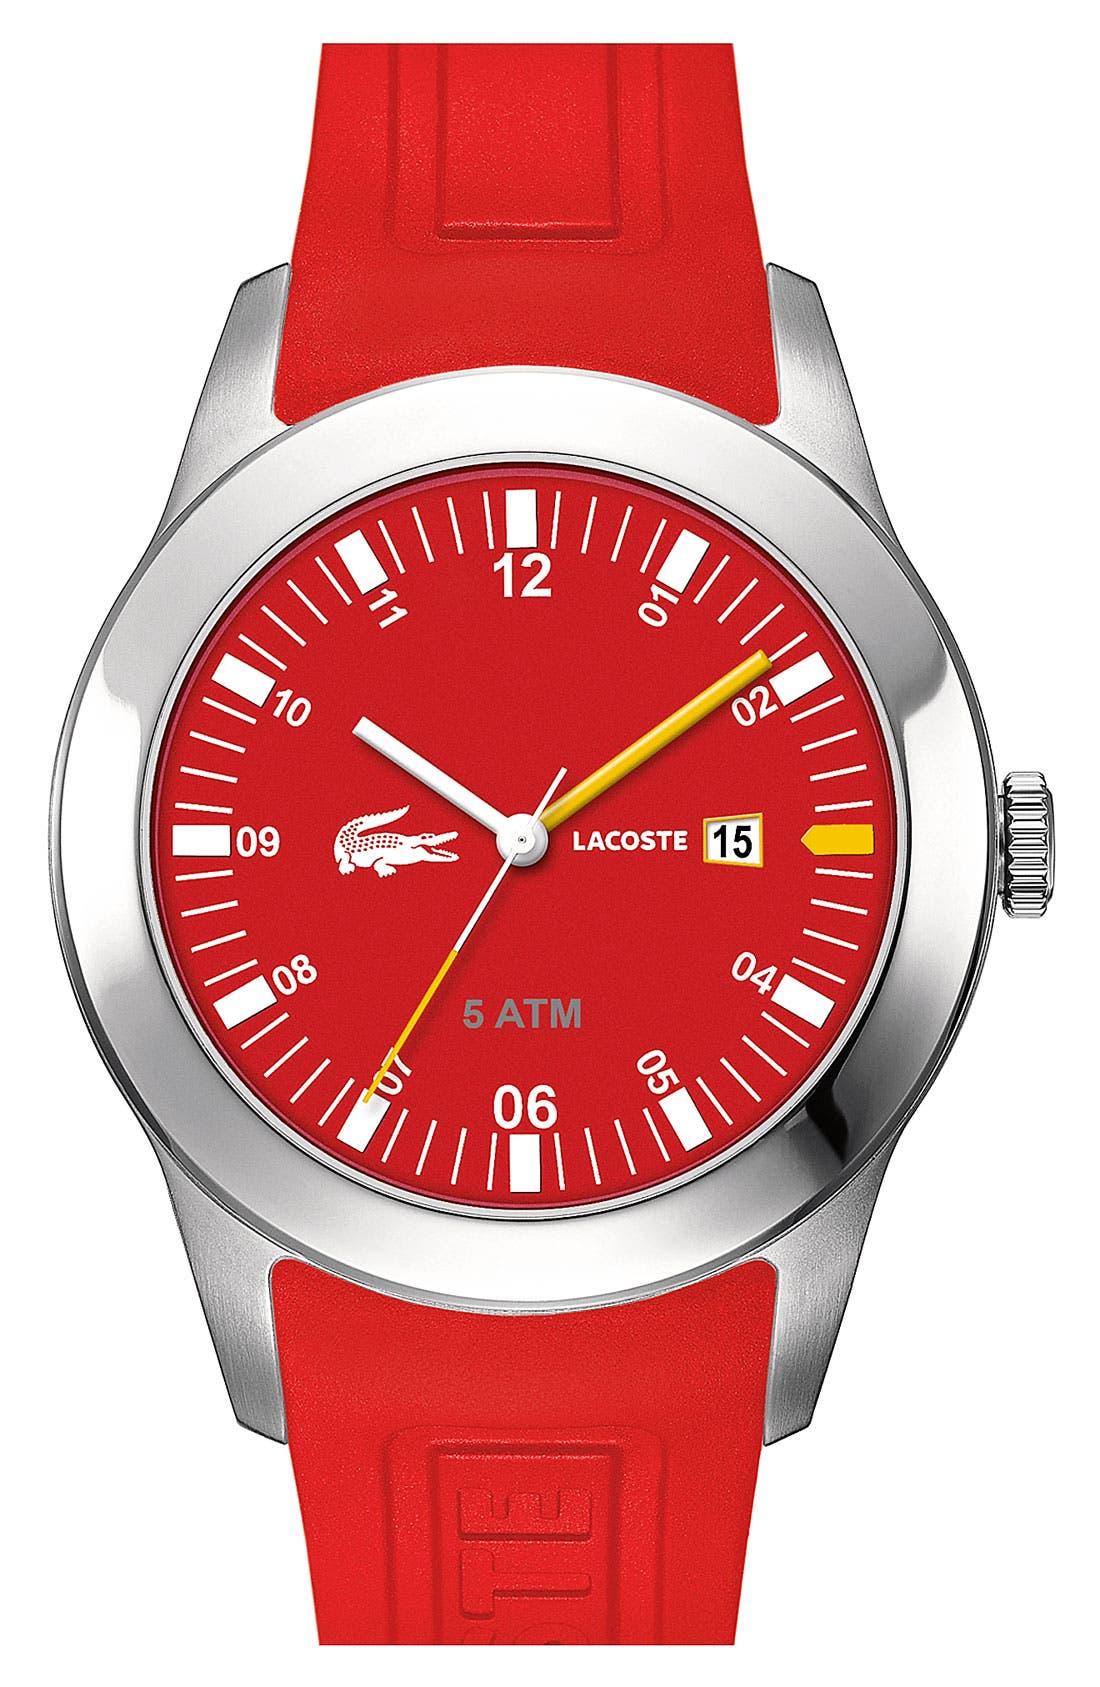 Main Image - Lacoste 'Advantage' Silicone Strap Watch, 42mm